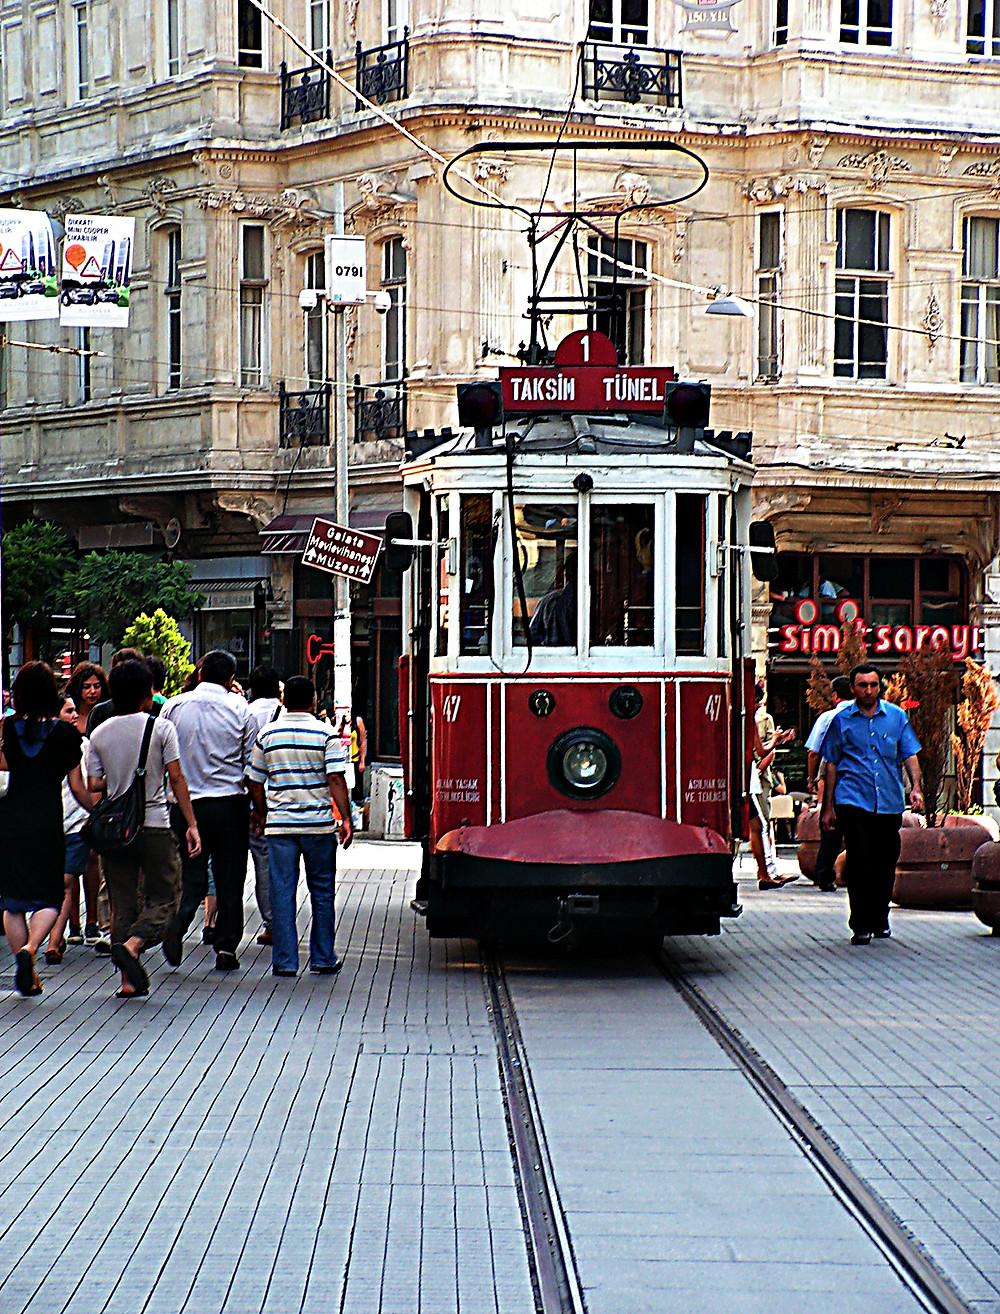 Istaklal Avenue in Beyoglu, Istanbul, Turkey